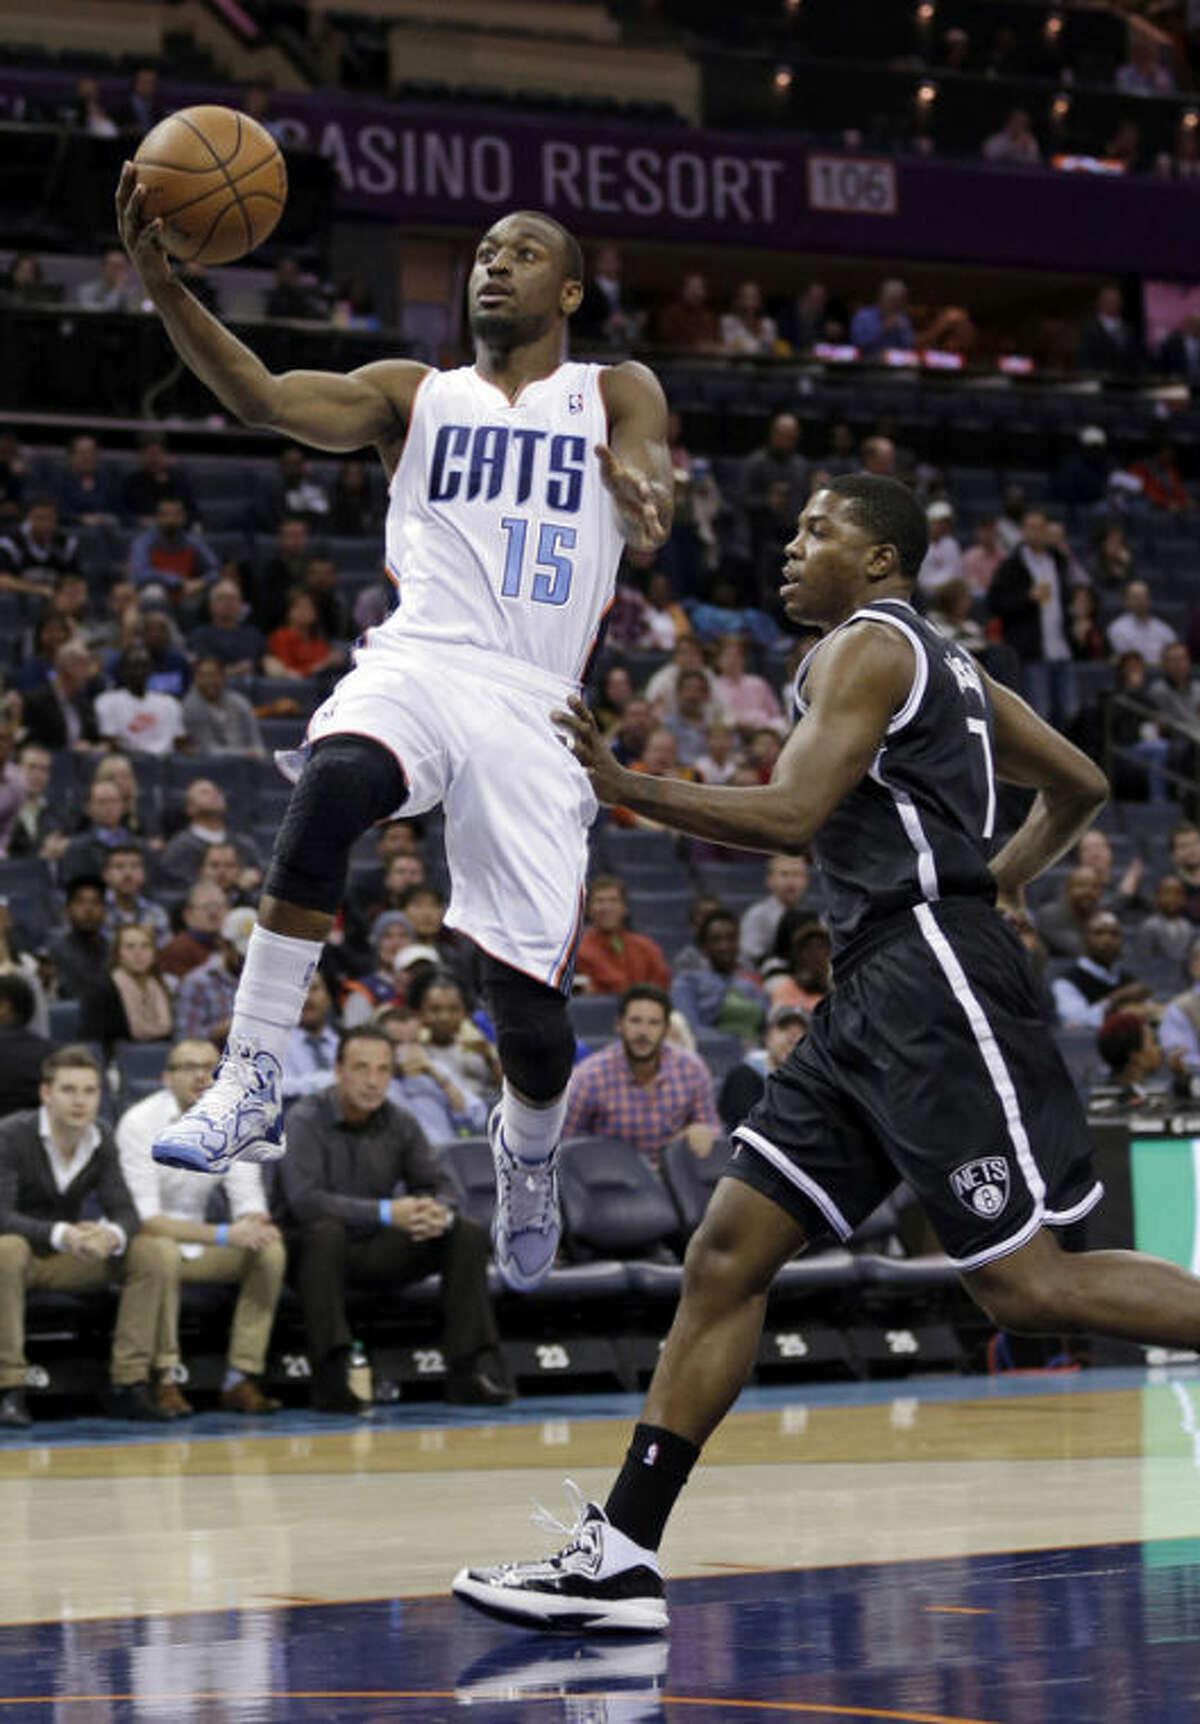 Charlotte Bobcats' Kemba Walker (15) drives past Brooklyn Nets' Joe Johnson during the first half of an NBA basketball game in Charlotte, N.C., Wednesday, Nov. 20, 2013. (AP Photo/Chuck Burton)